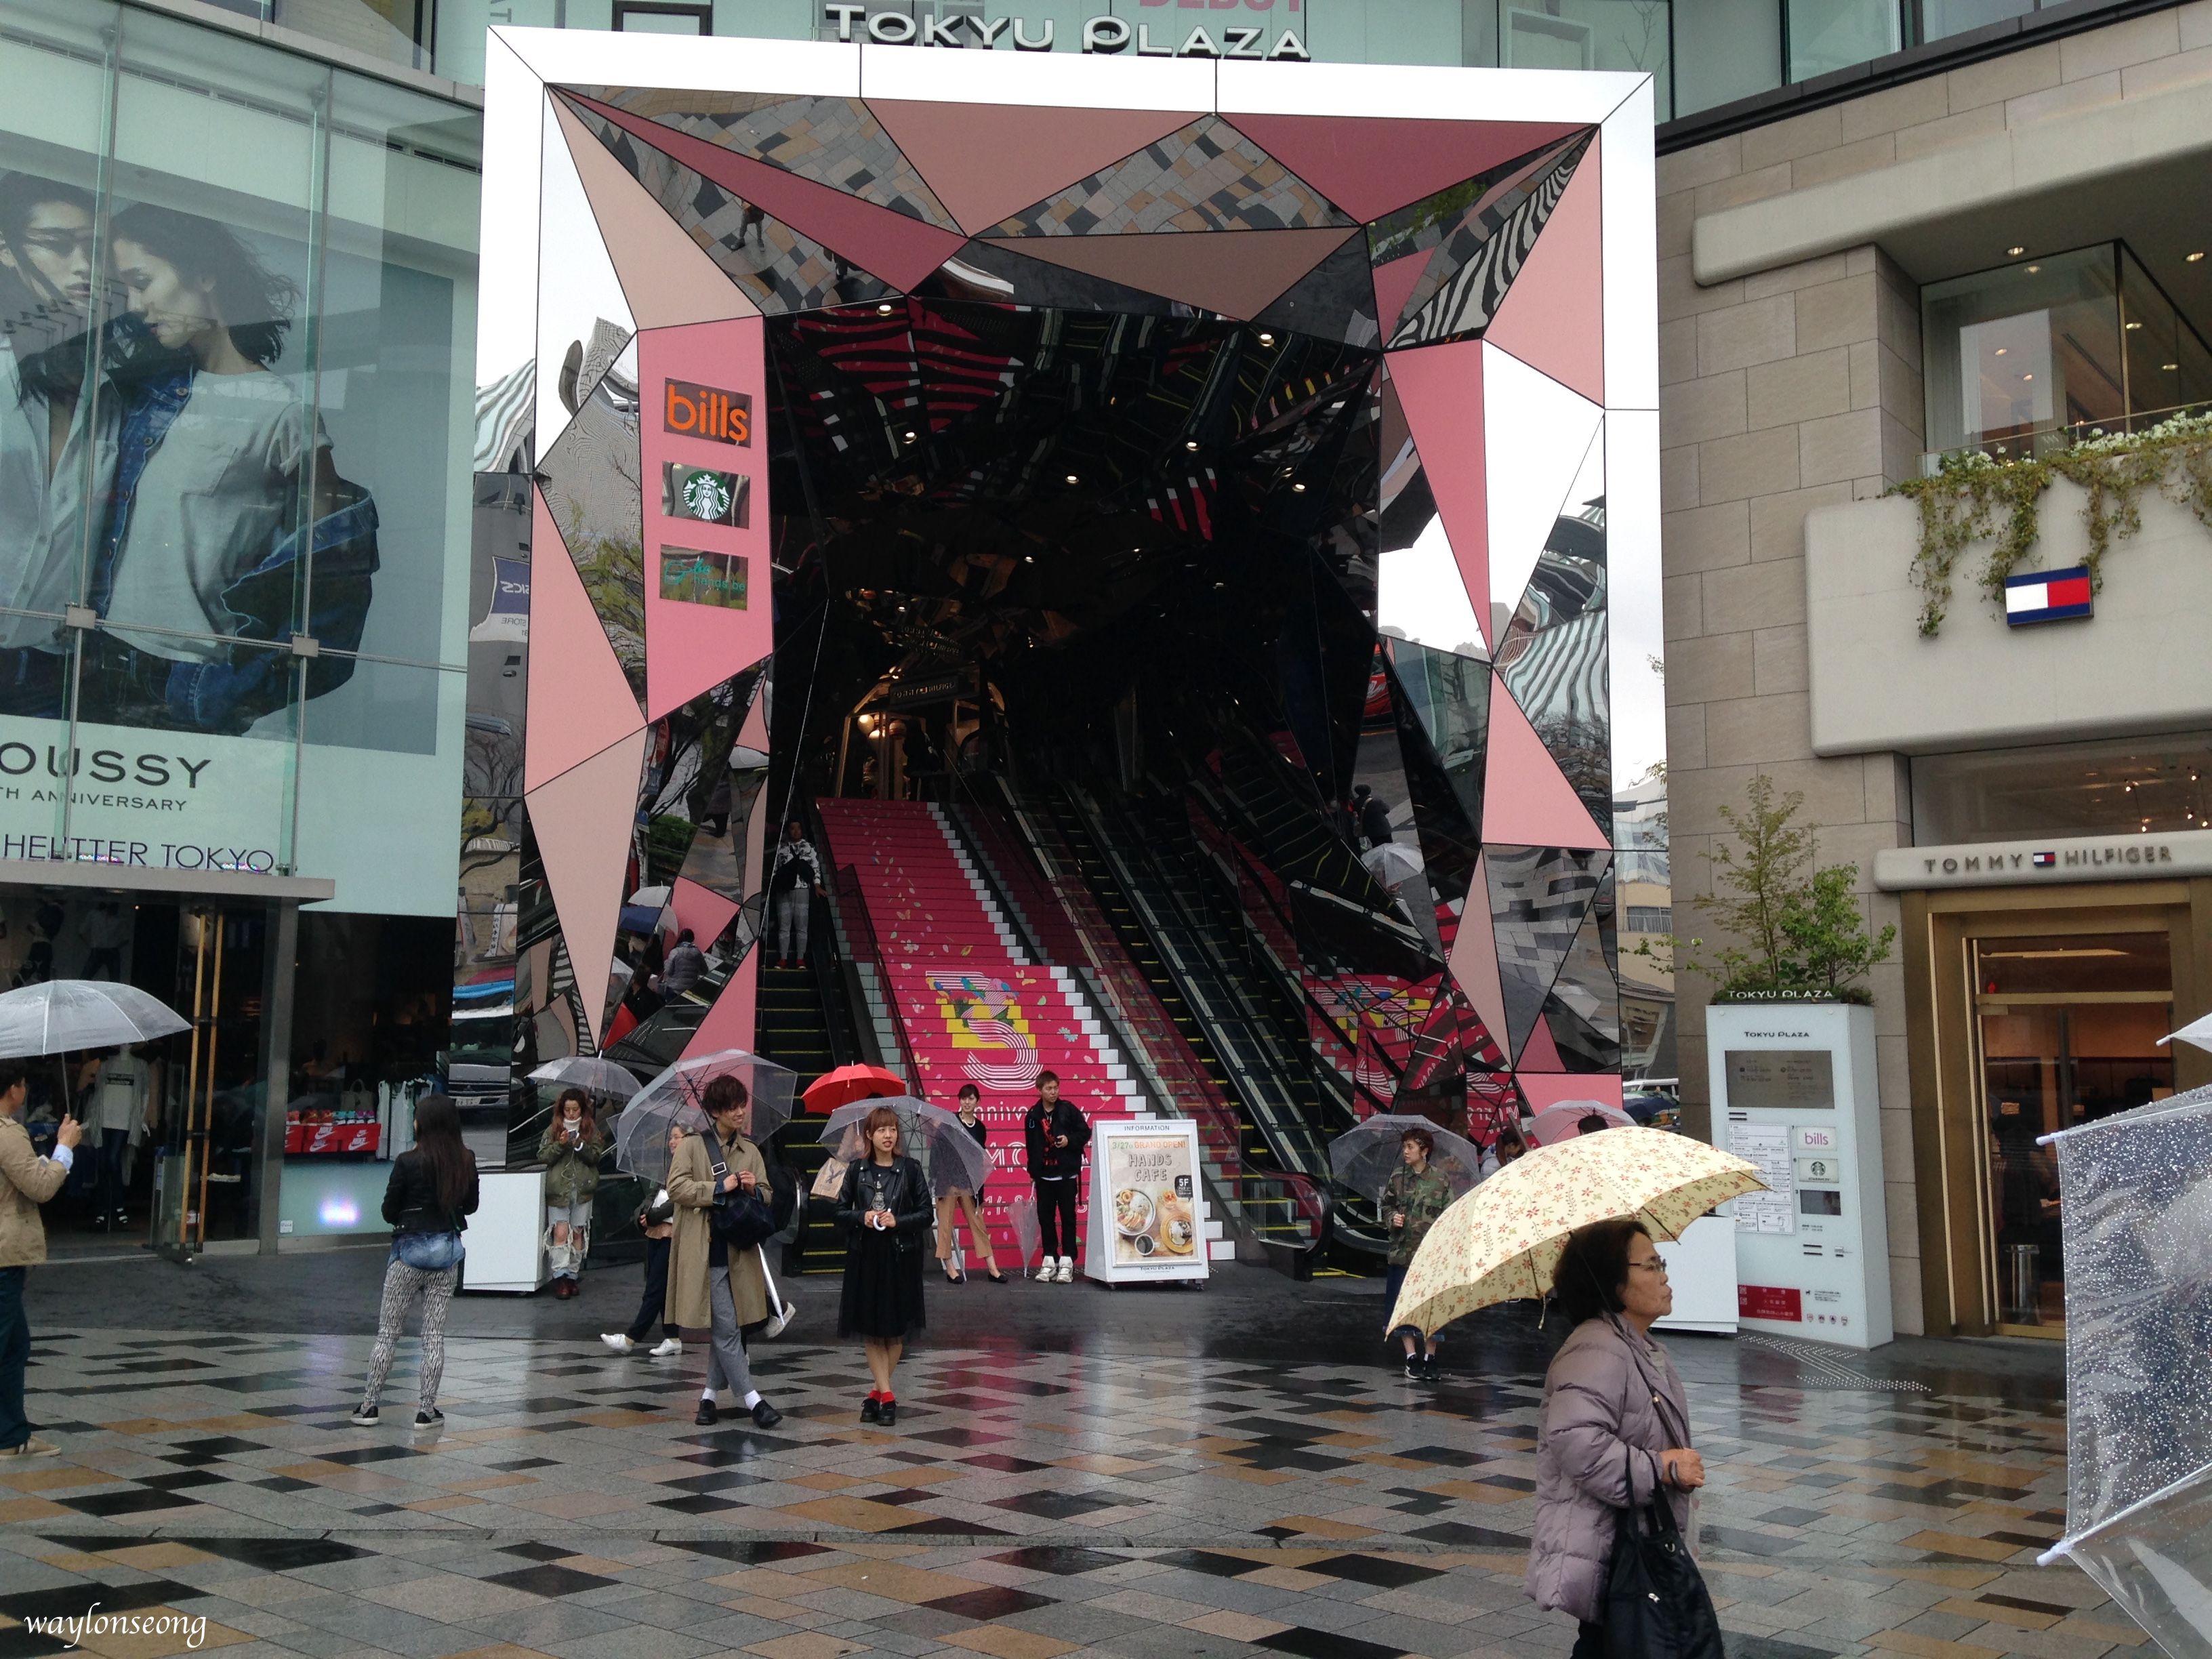 Tokyo Plaza Tokyo Japan